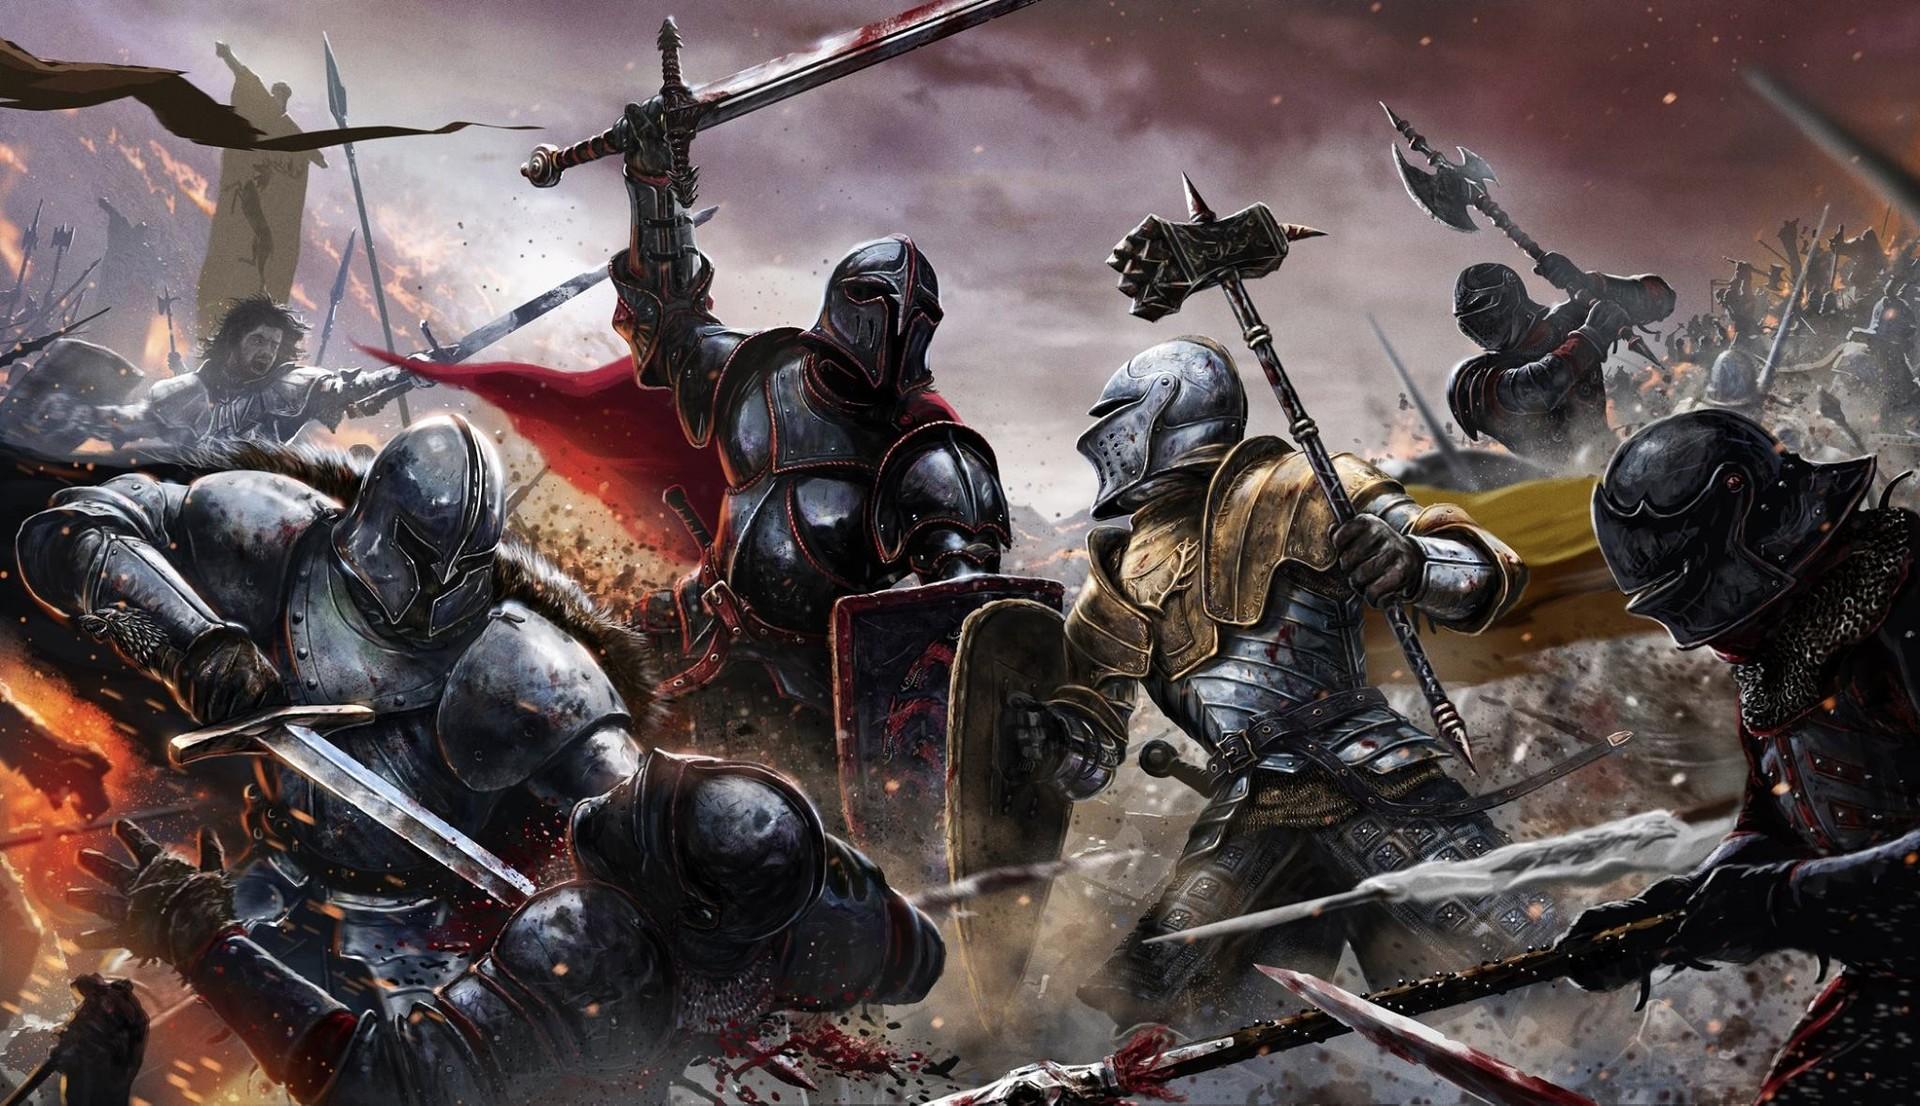 Scene of war